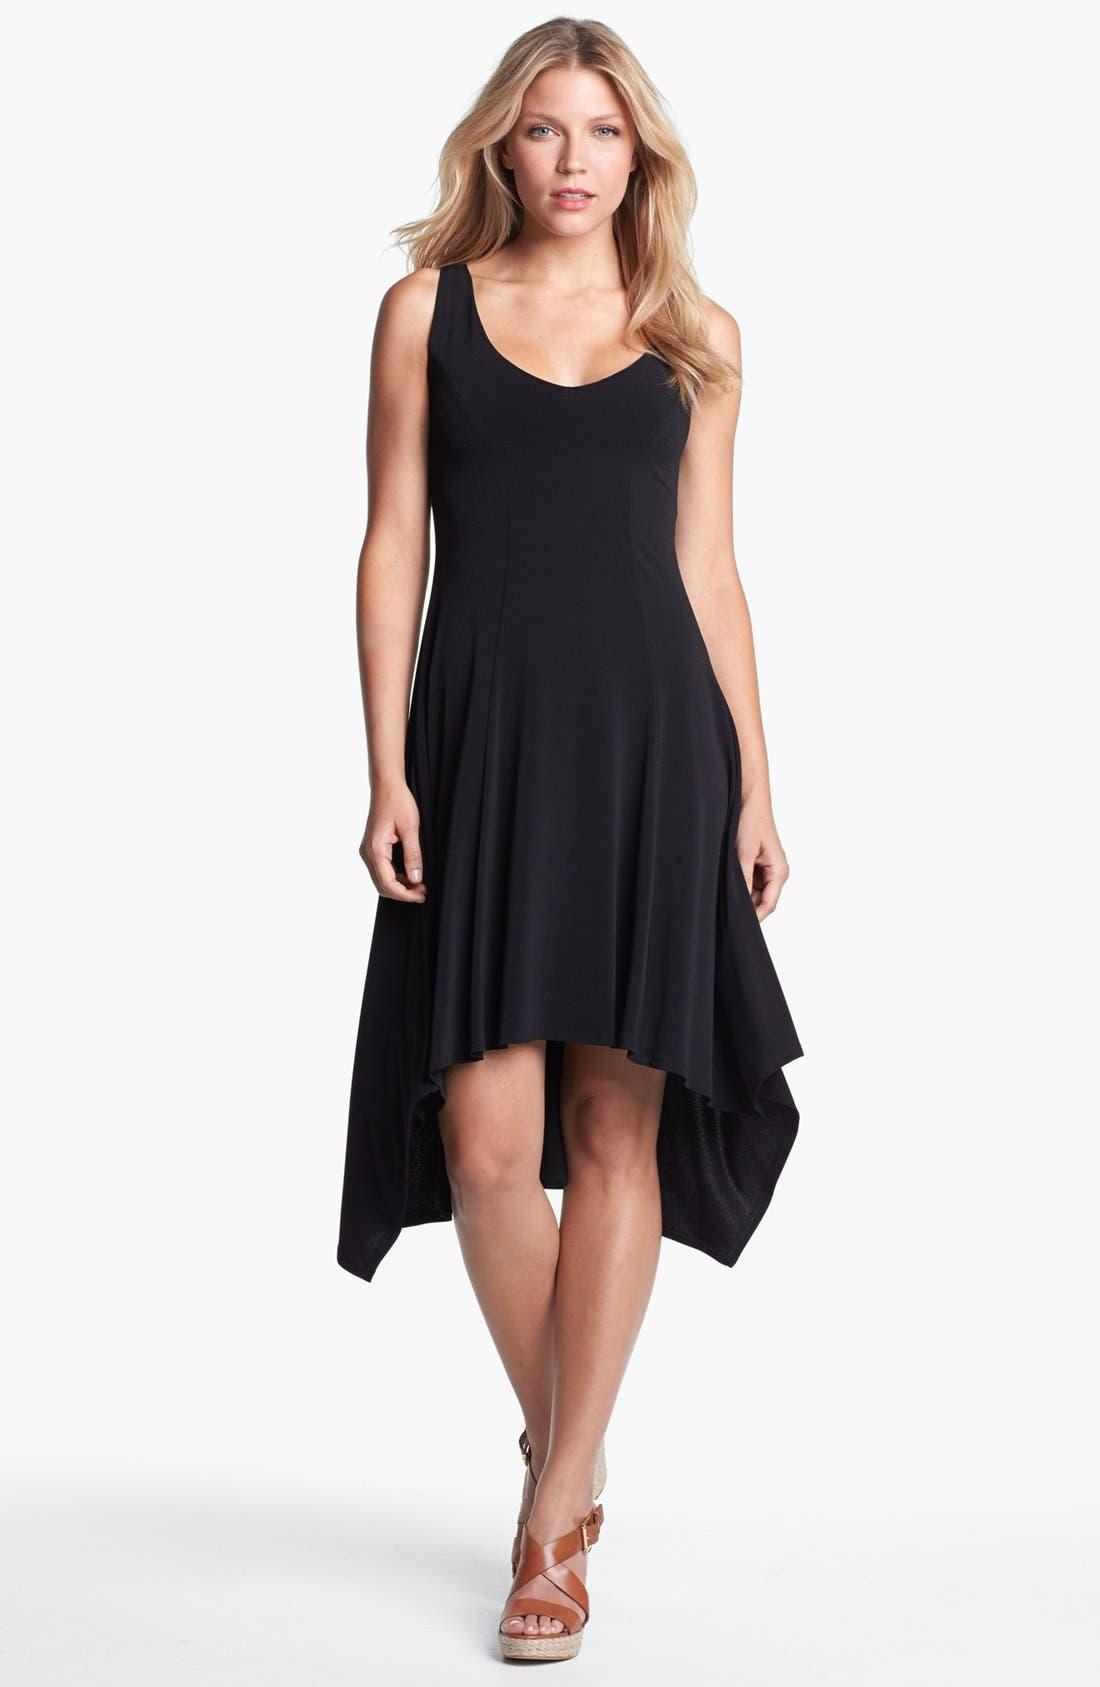 Alternate Image 1 Selected - Karen Kane V-Neck High/Low Dress